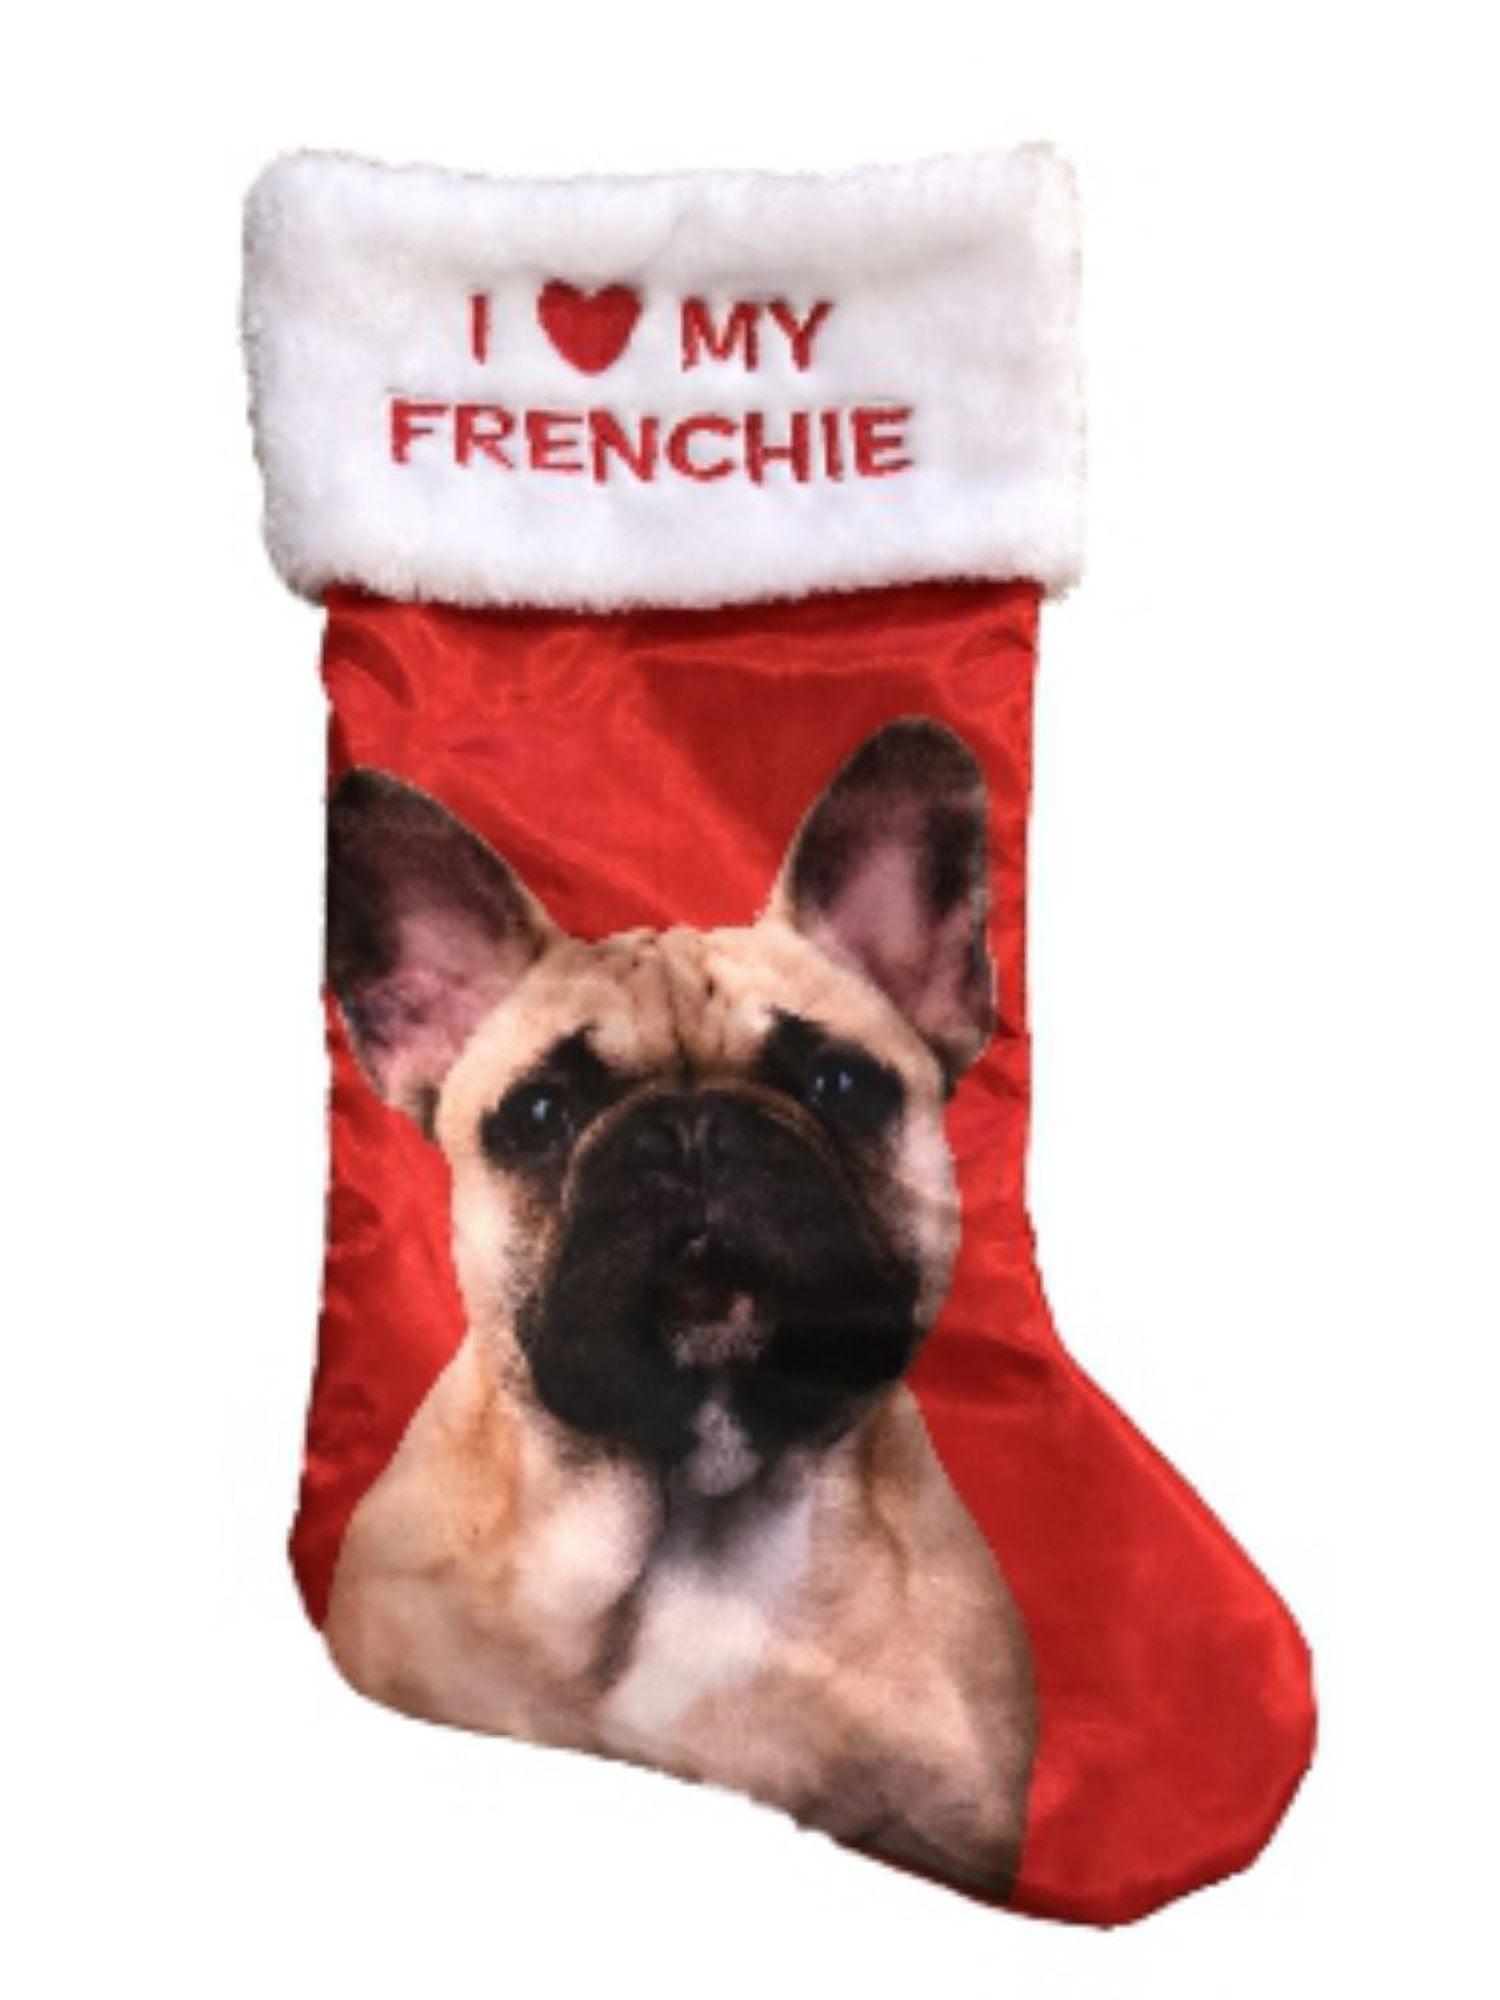 French Bulldog Xmas Stocking Silk Plush I Love My Frenchie Pet Holiday Decor New